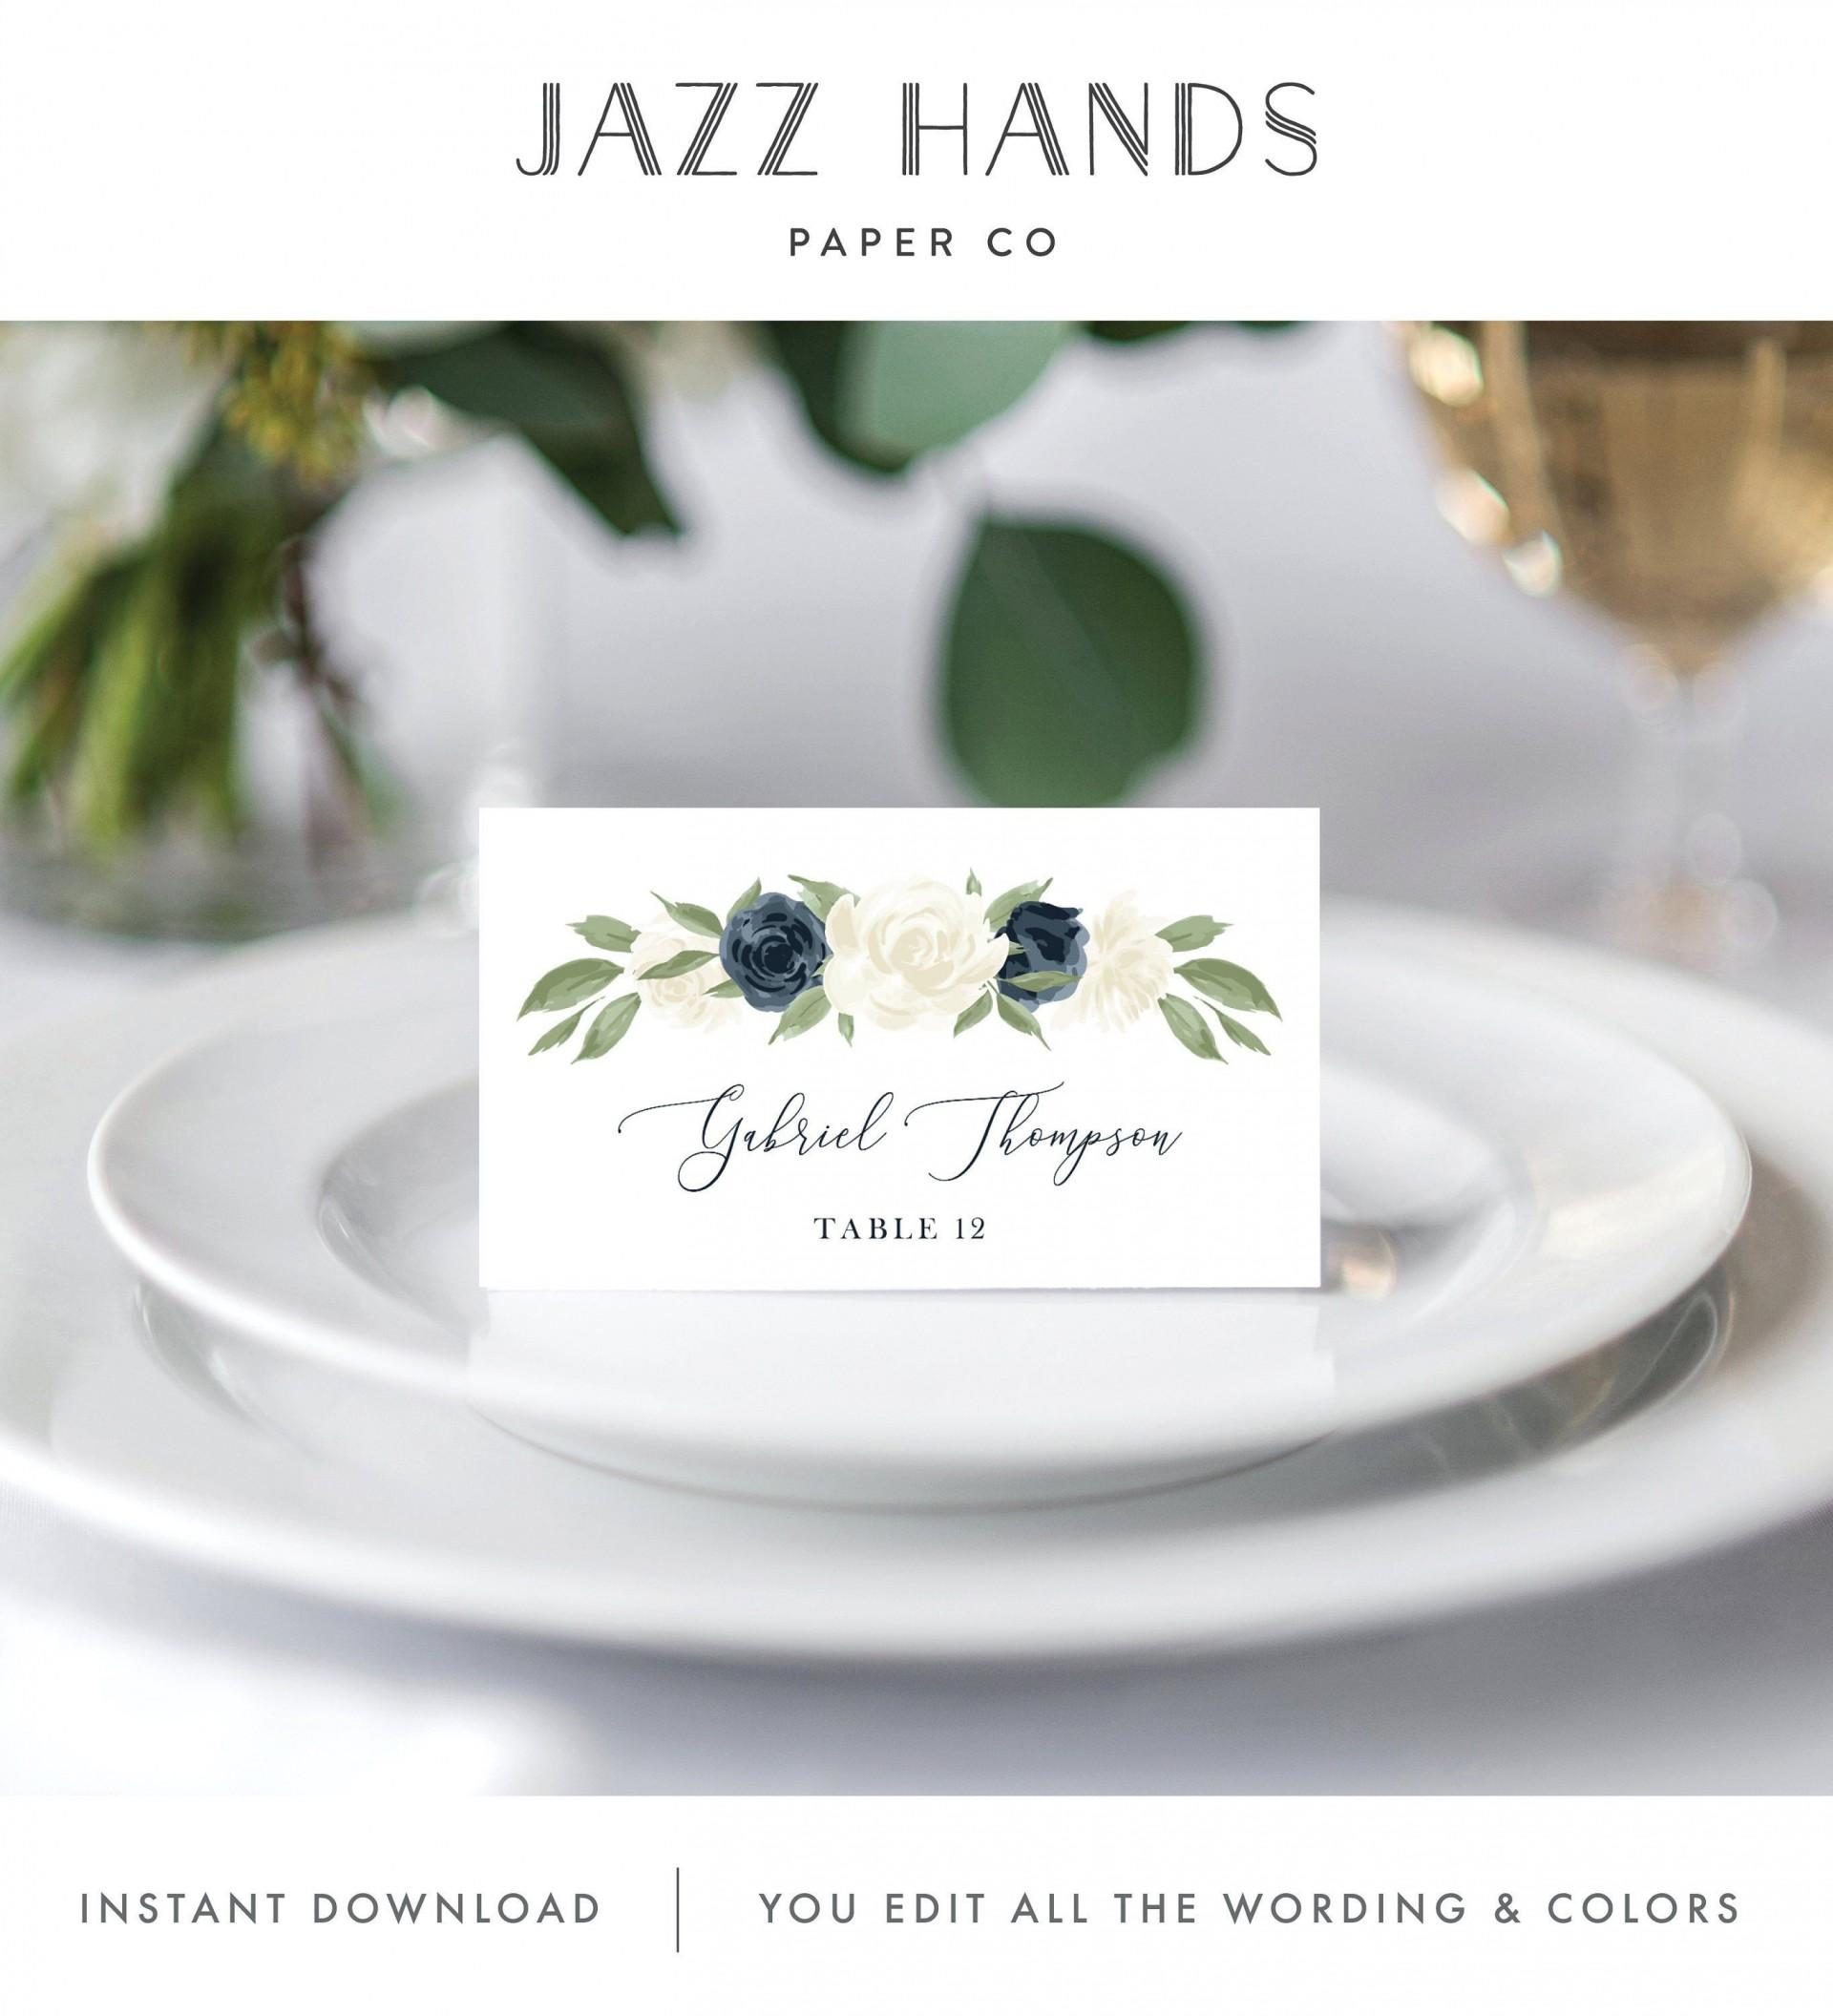 007 Stupendou Wedding Name Card Template Sample  Free Download Design Sticker Format1920